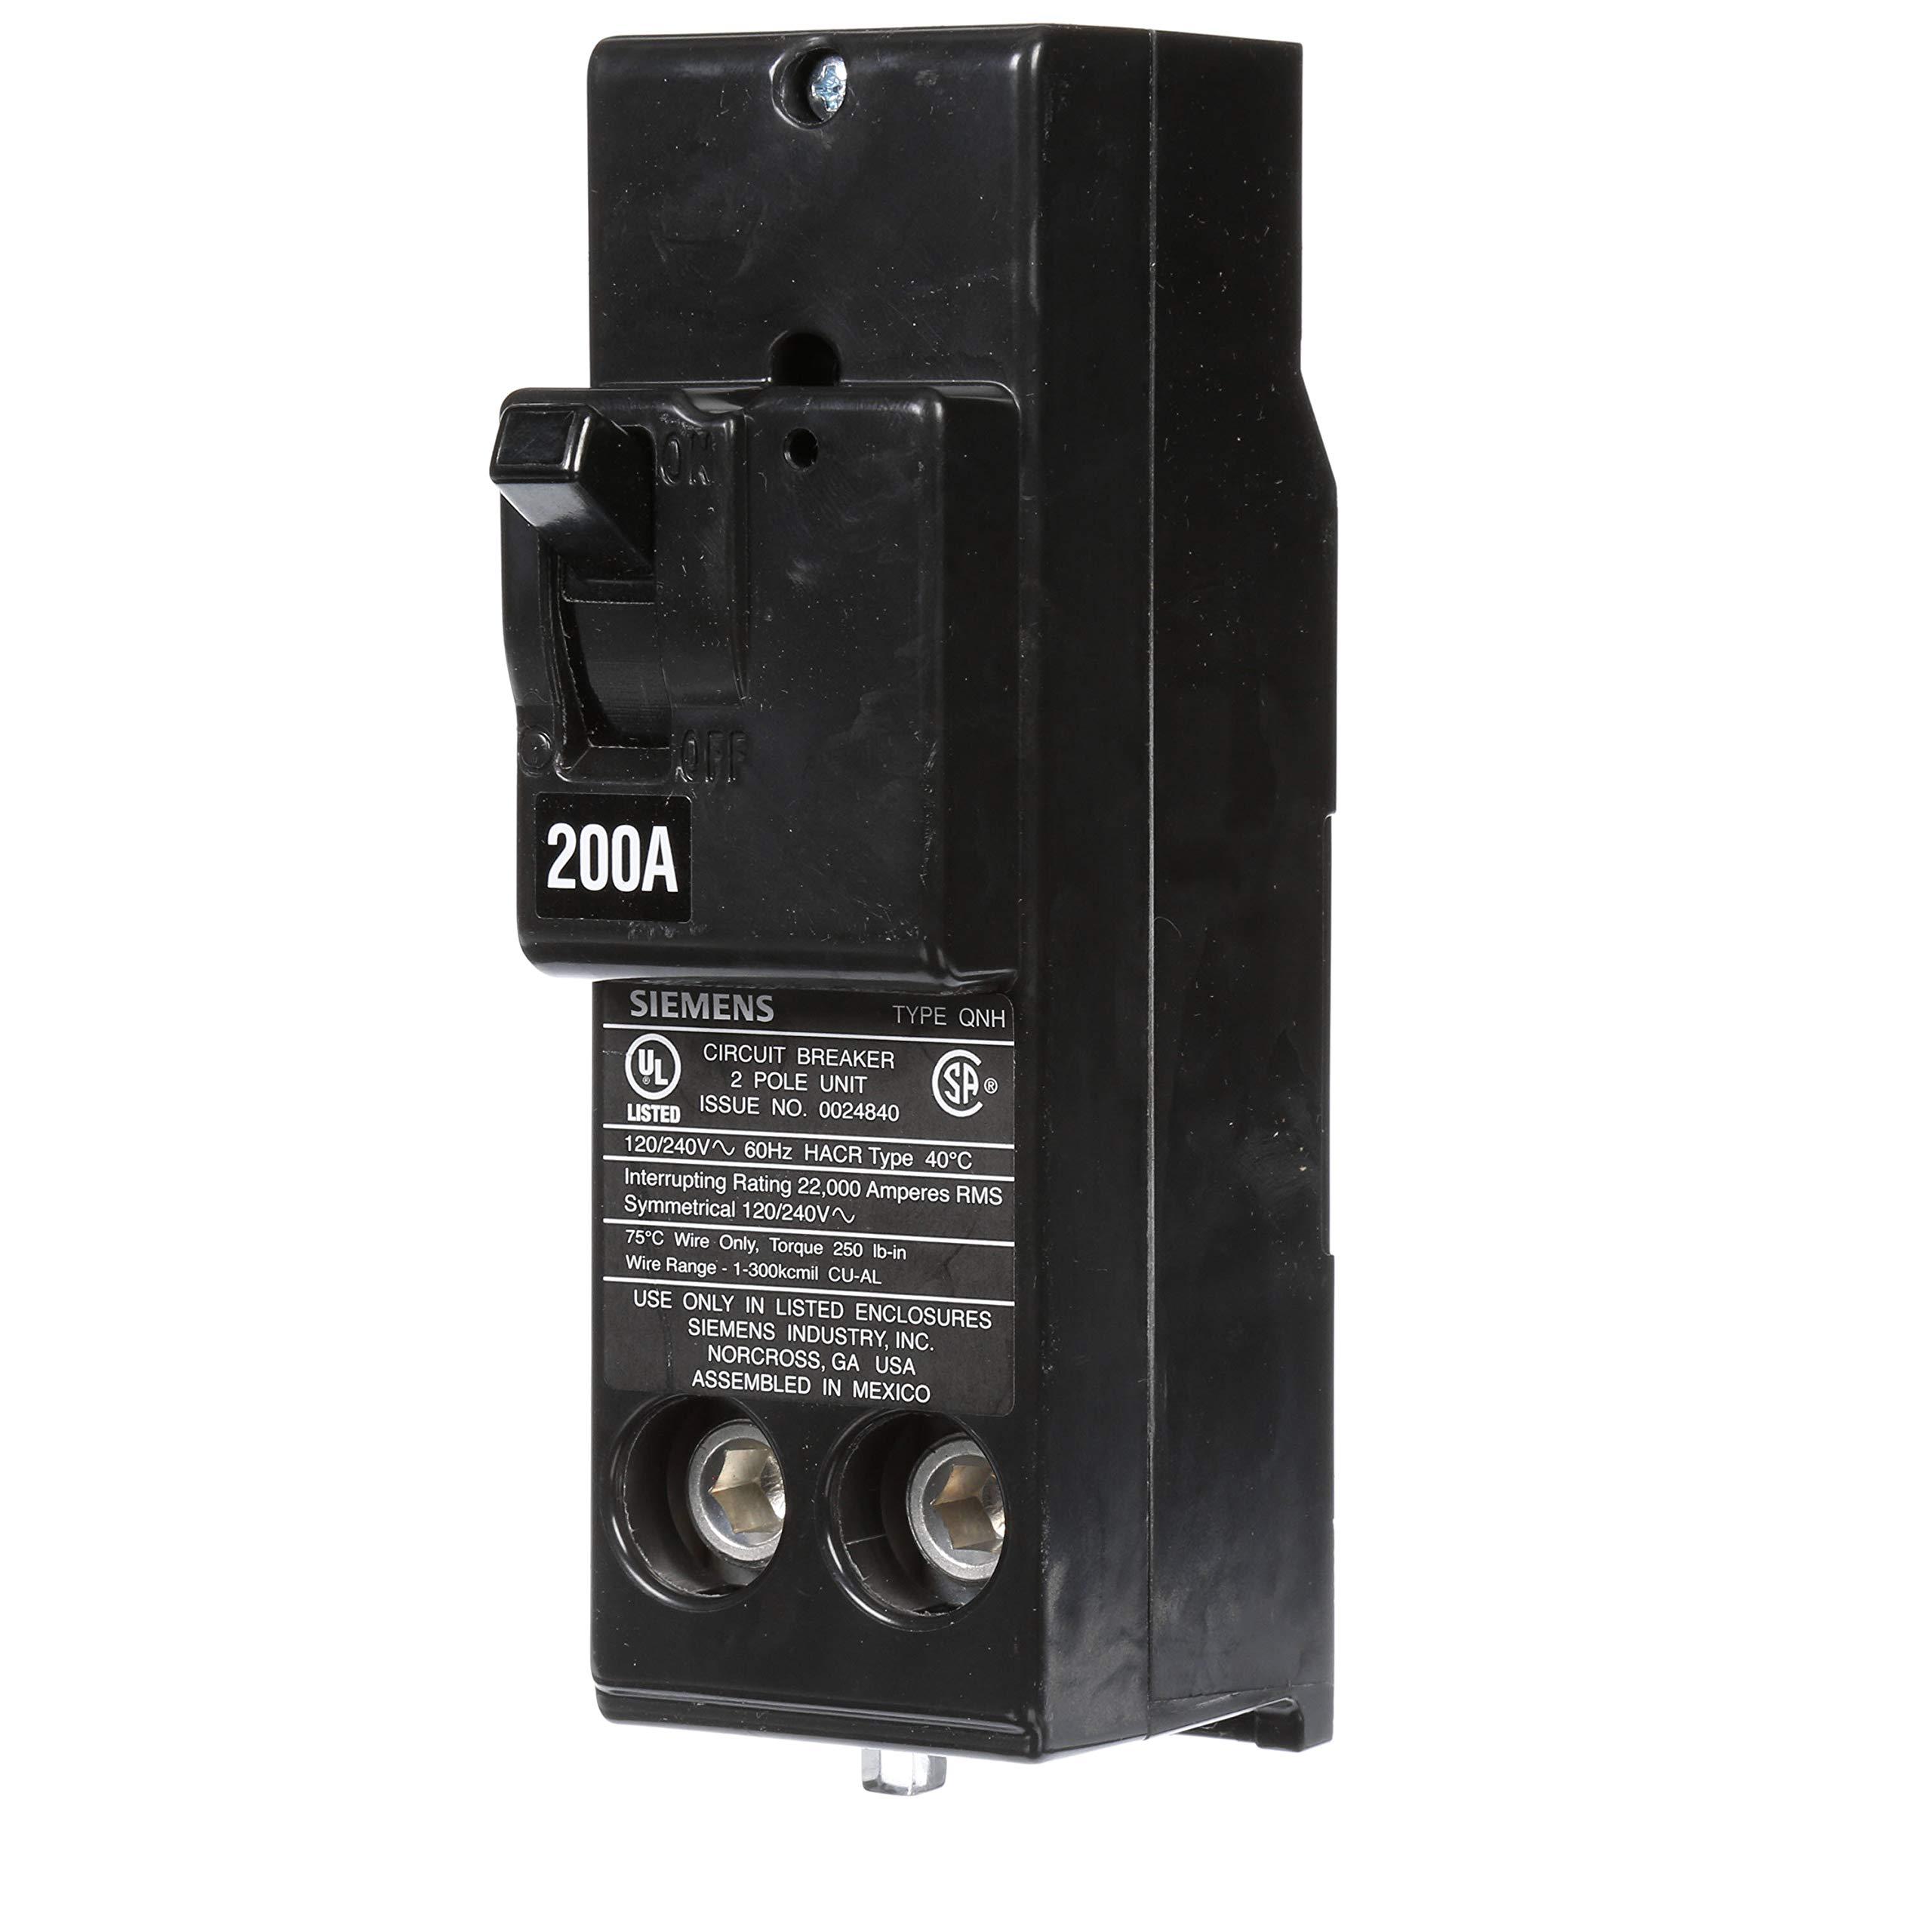 Siemens QN2200H 200A Double Pole 120/240-Volt 22K type QNH Circuit Breaker by SIEMENS